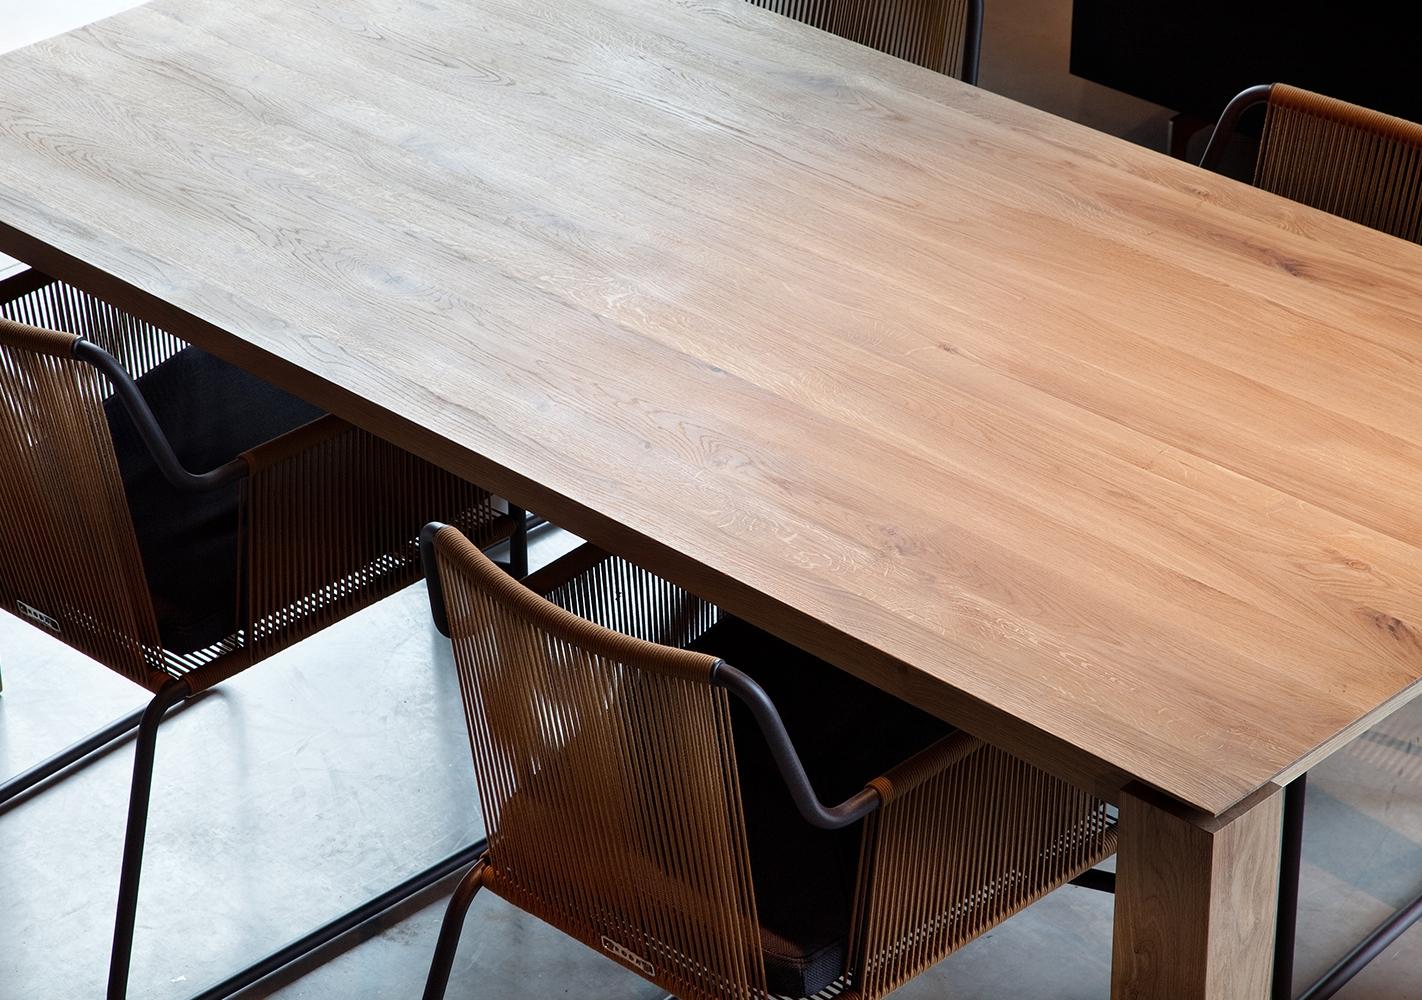 Table Slice en chene pieds 10x10cm - ETHNICRAFT